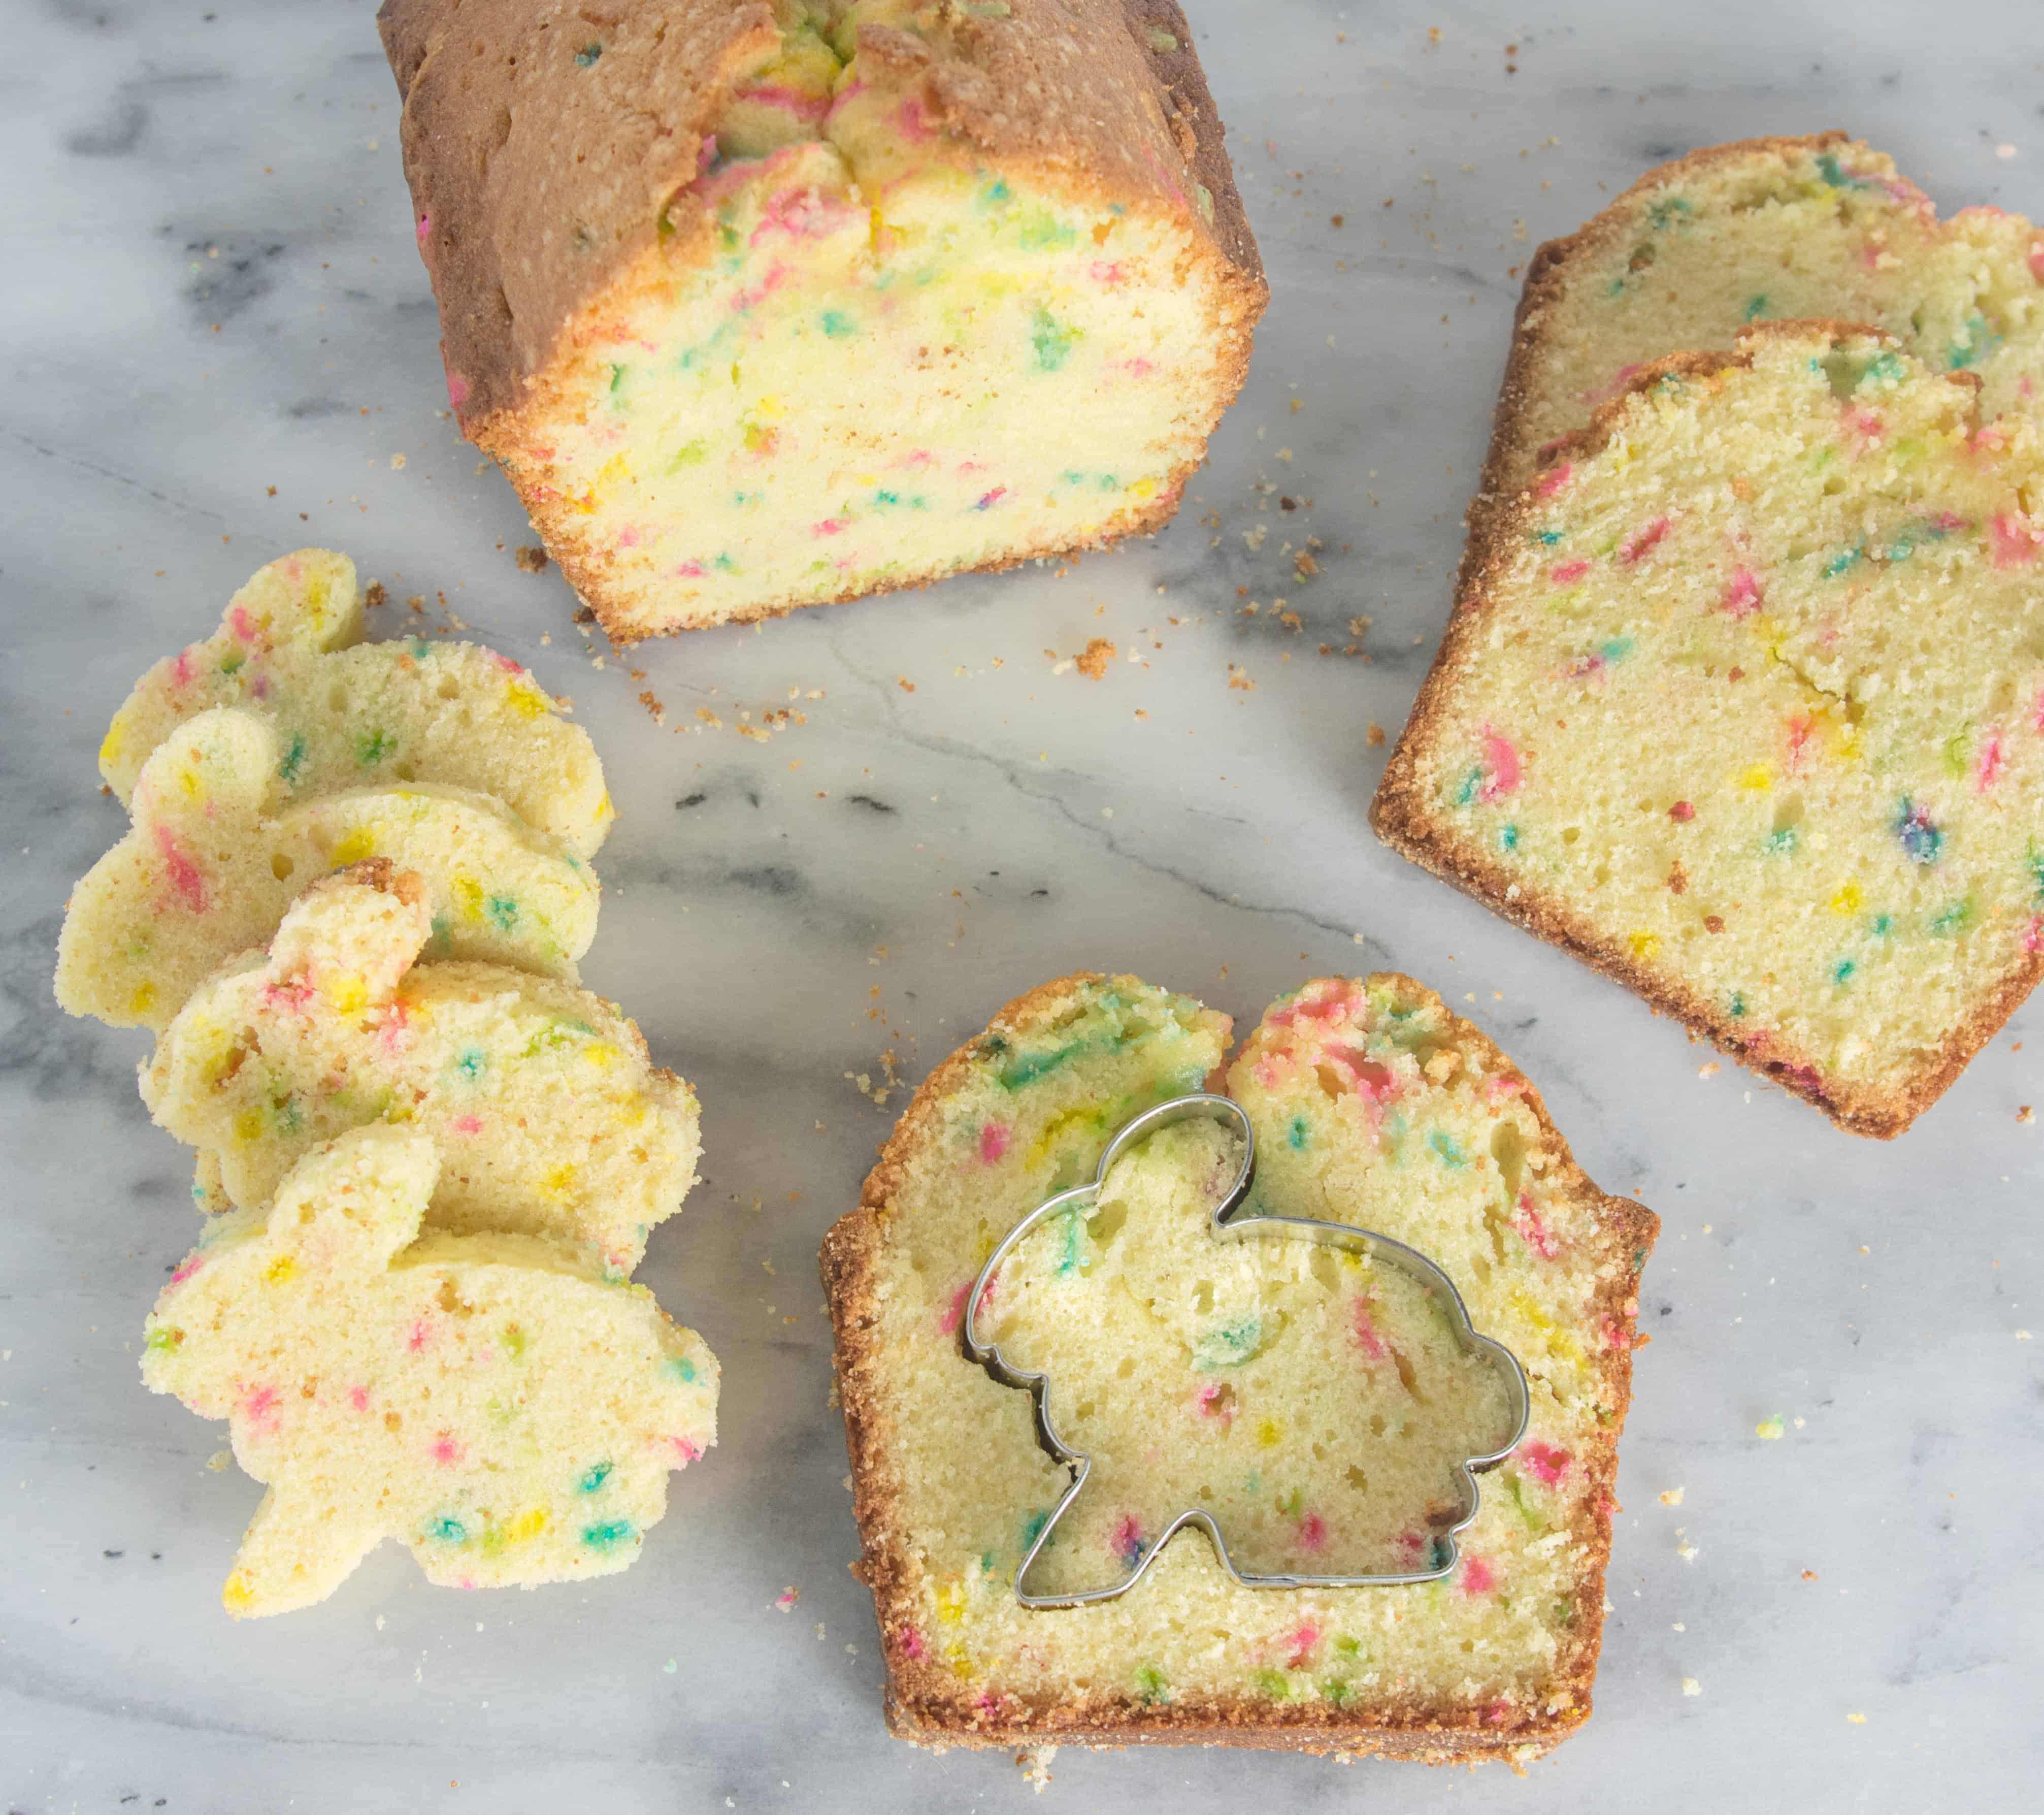 Chocolate Funfetti Hidden Bunny Cake - The Itsy-Bitsy Kitchen